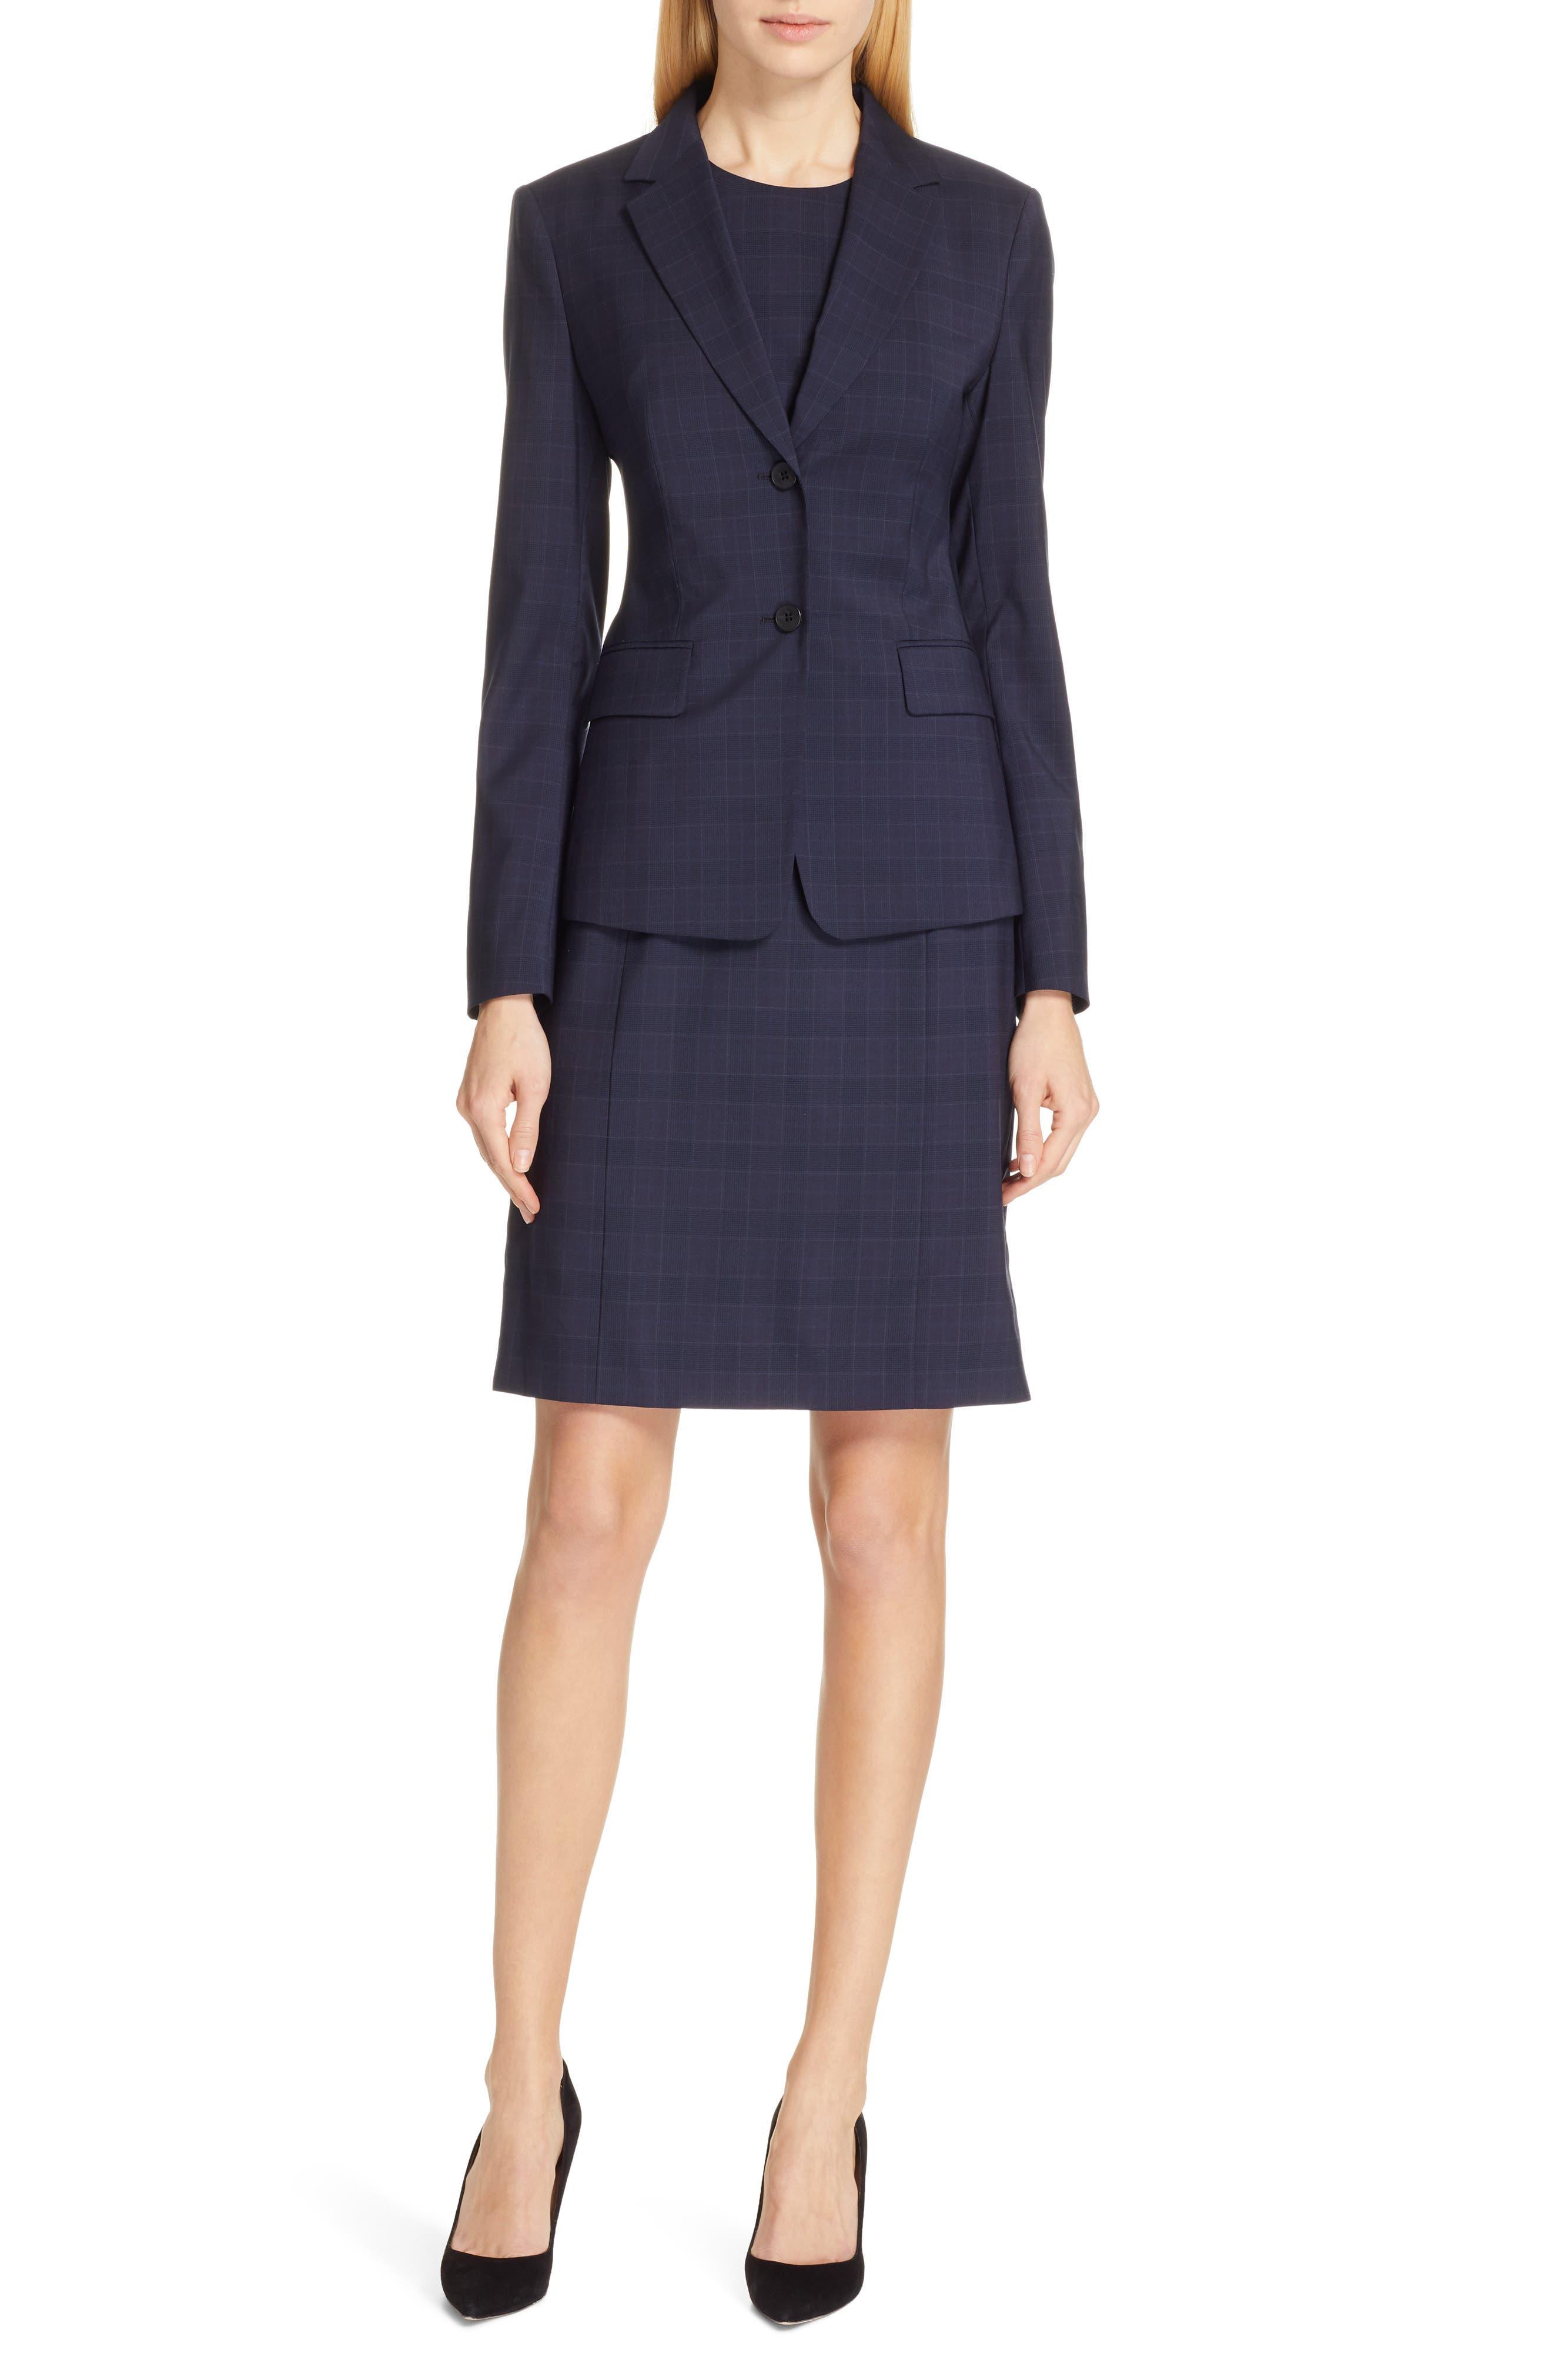 BOSS, Docanes Modern Check Wool Dress, Alternate thumbnail 8, color, DARK NAVY FANTASY